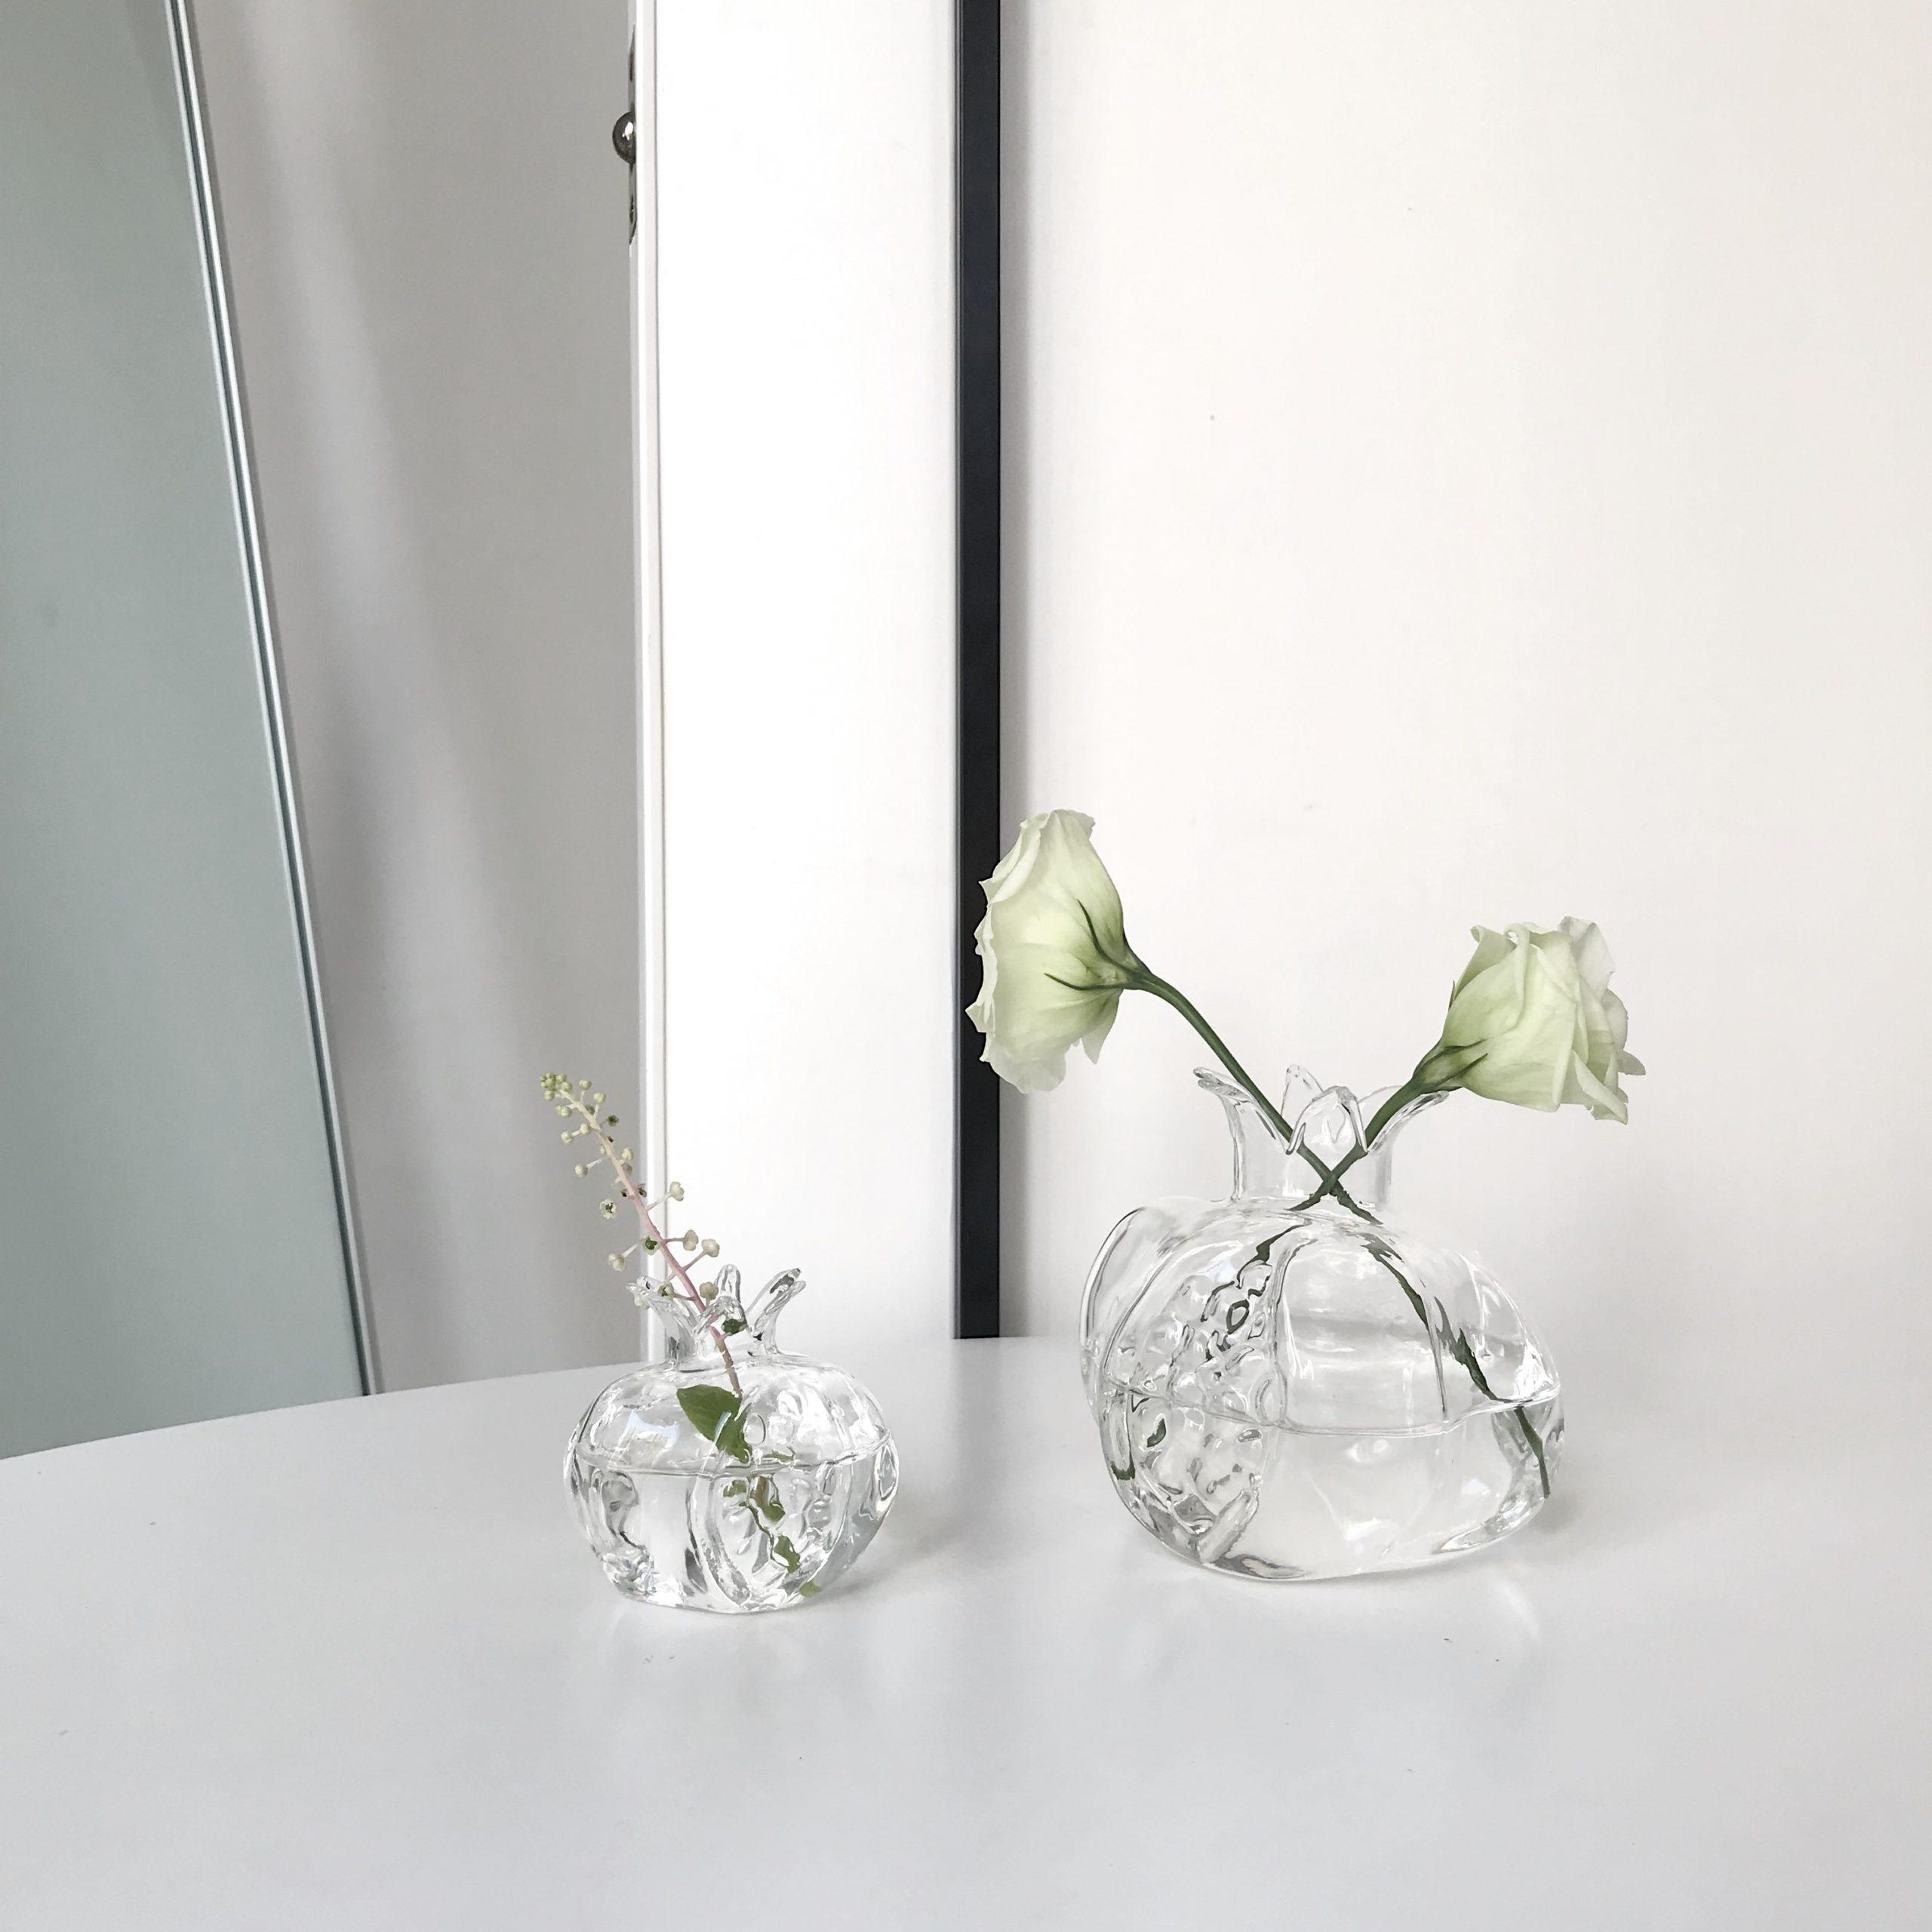 Nordic Creative glass vase Transparent pomegranate Small vase Mini Desktop decoration Flower arrangement Hydroponics